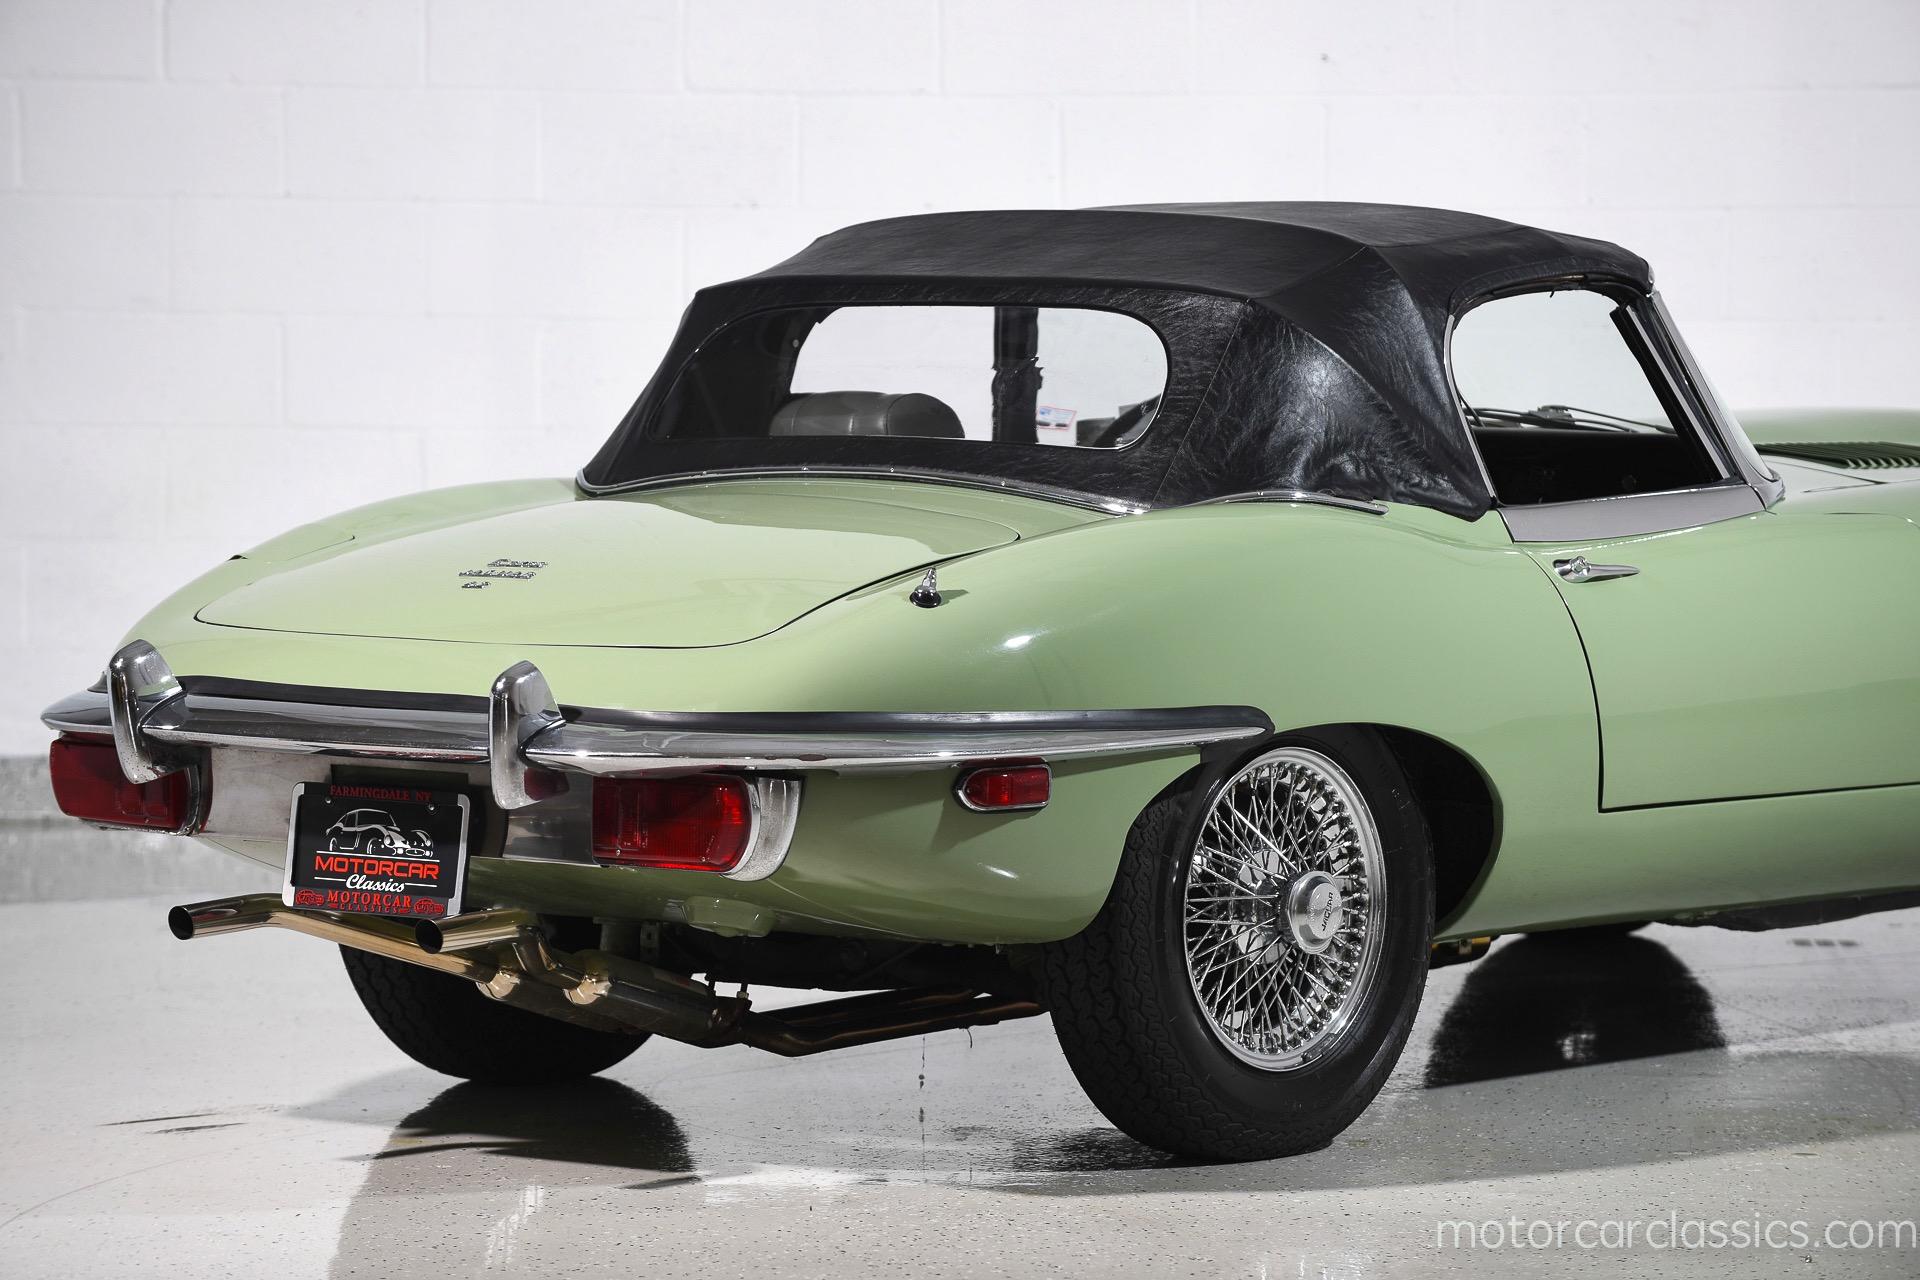 Used 1969 Jaguar E-Type Roadster For Sale ($64,900) | Motorcar Classics Stock #1160